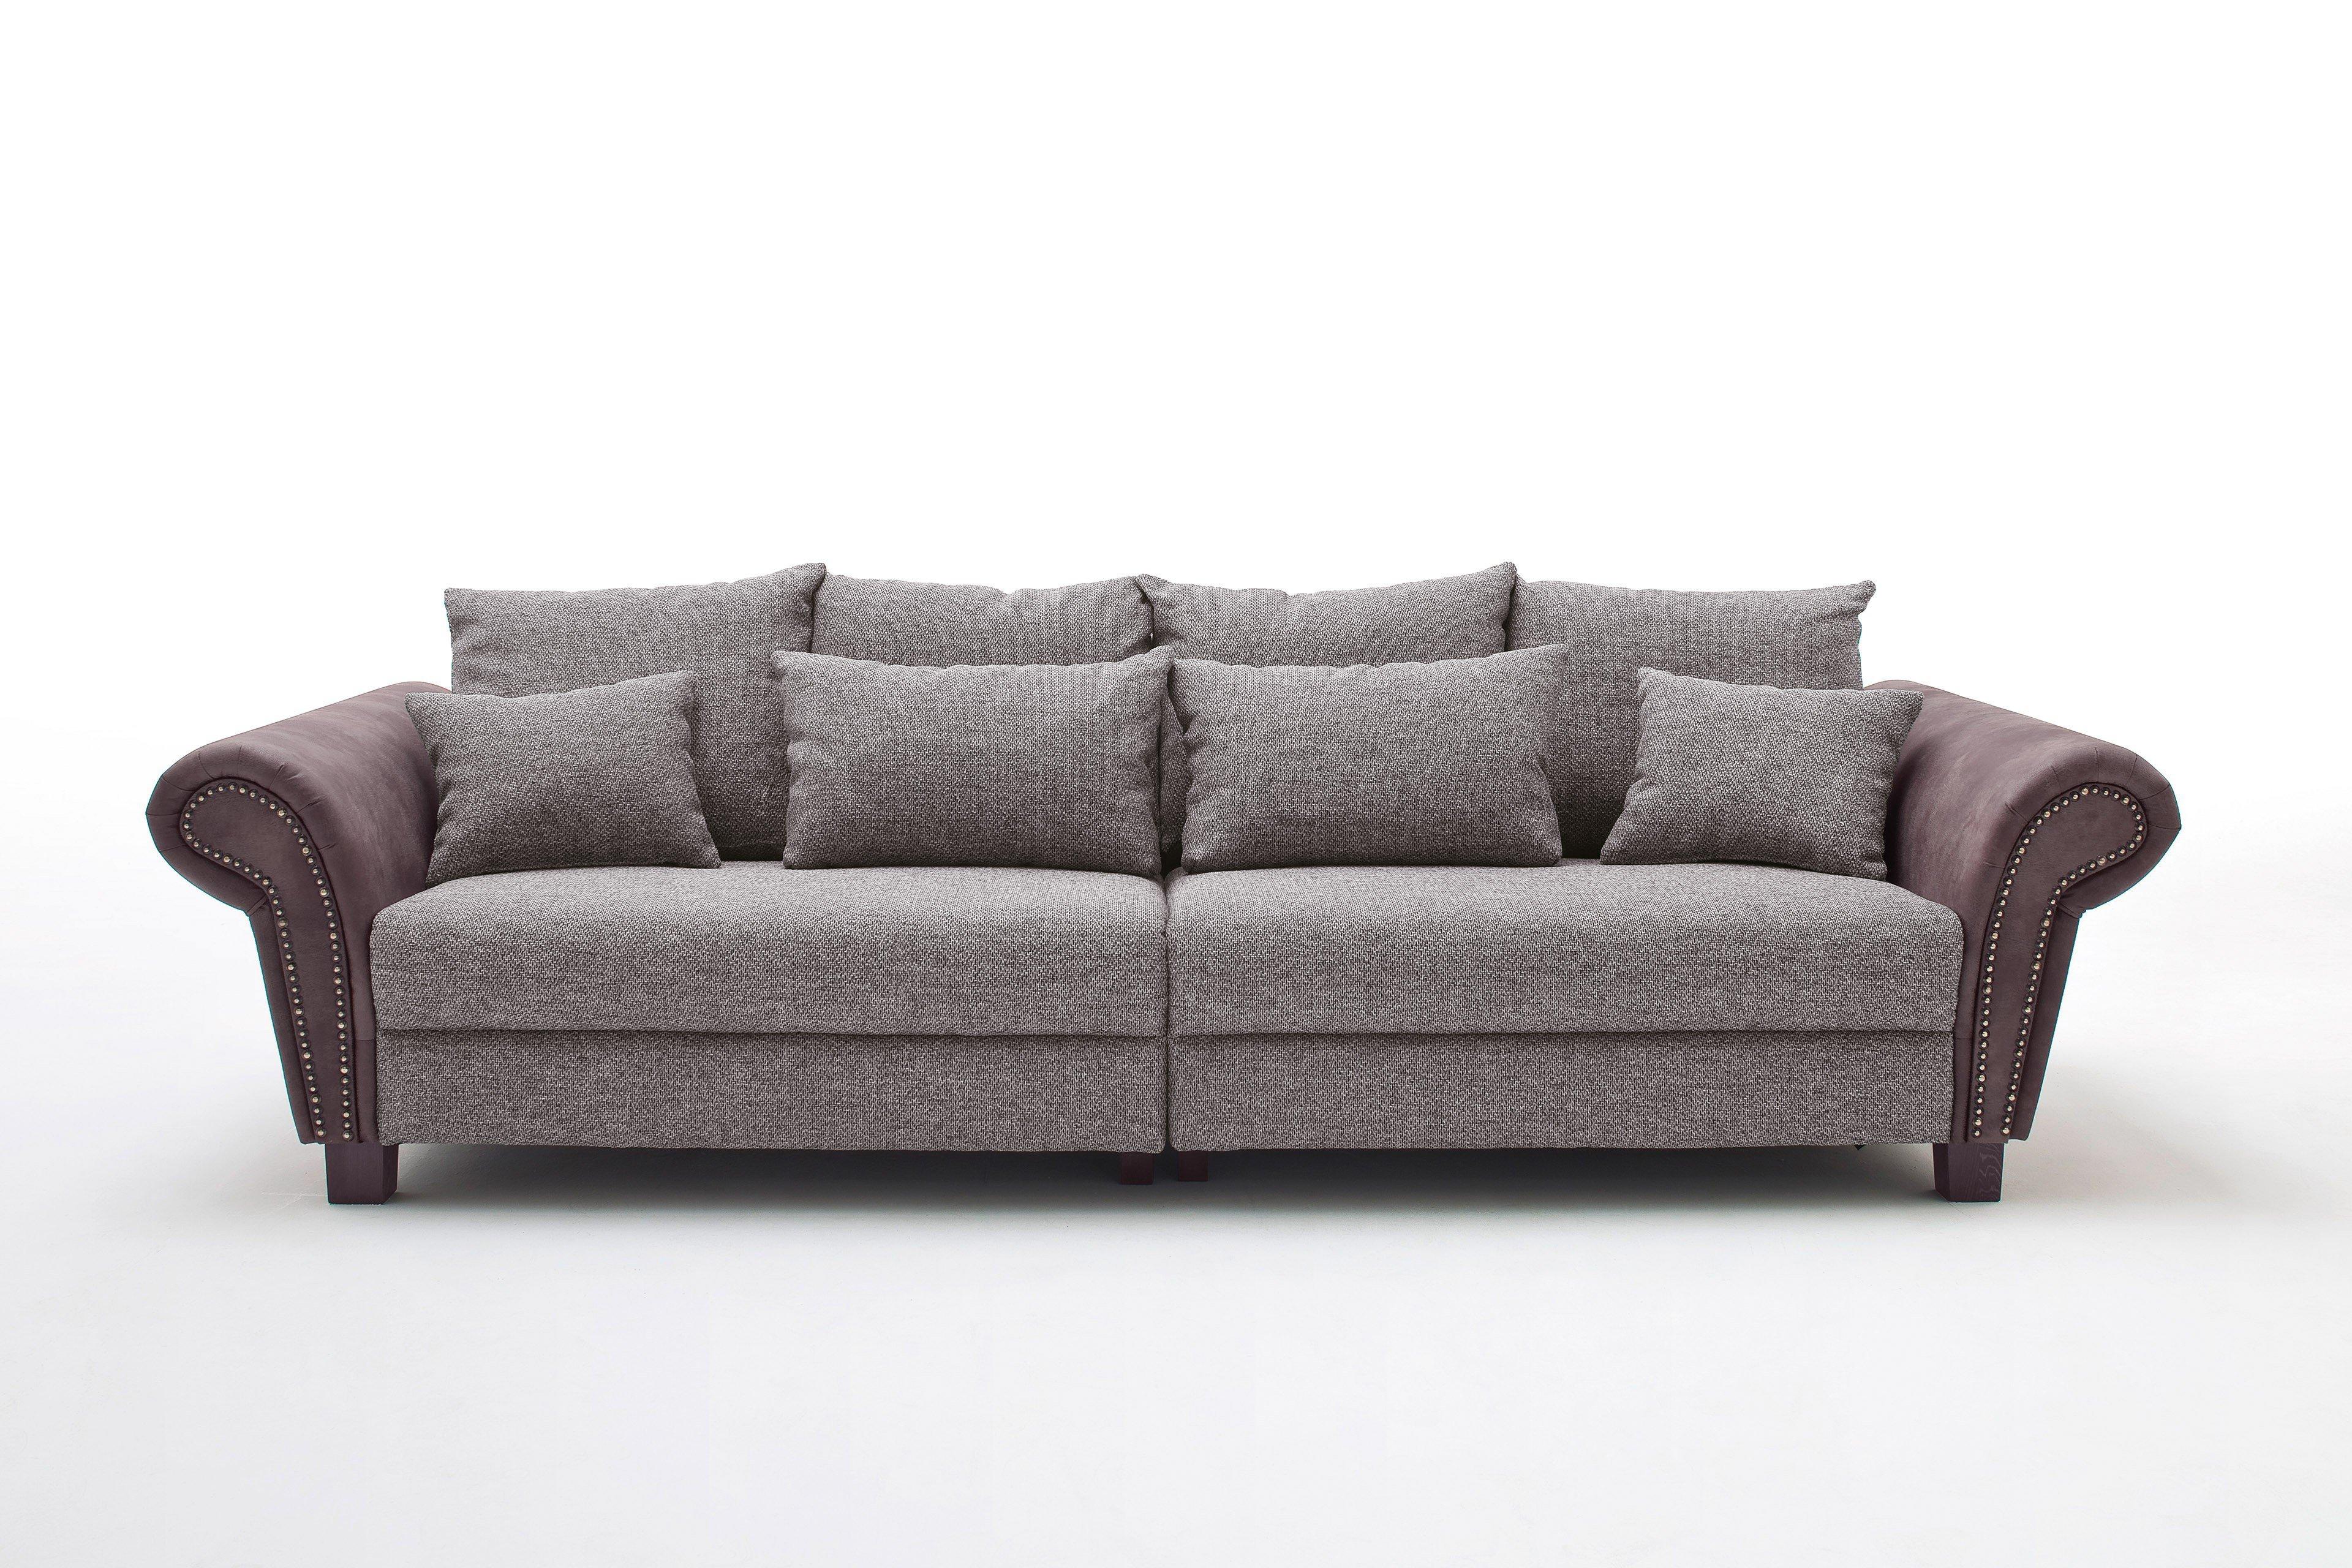 Megasofa grau  Reality Sheffield Megasofa grau-braun | Möbel Letz - Ihr Online-Shop